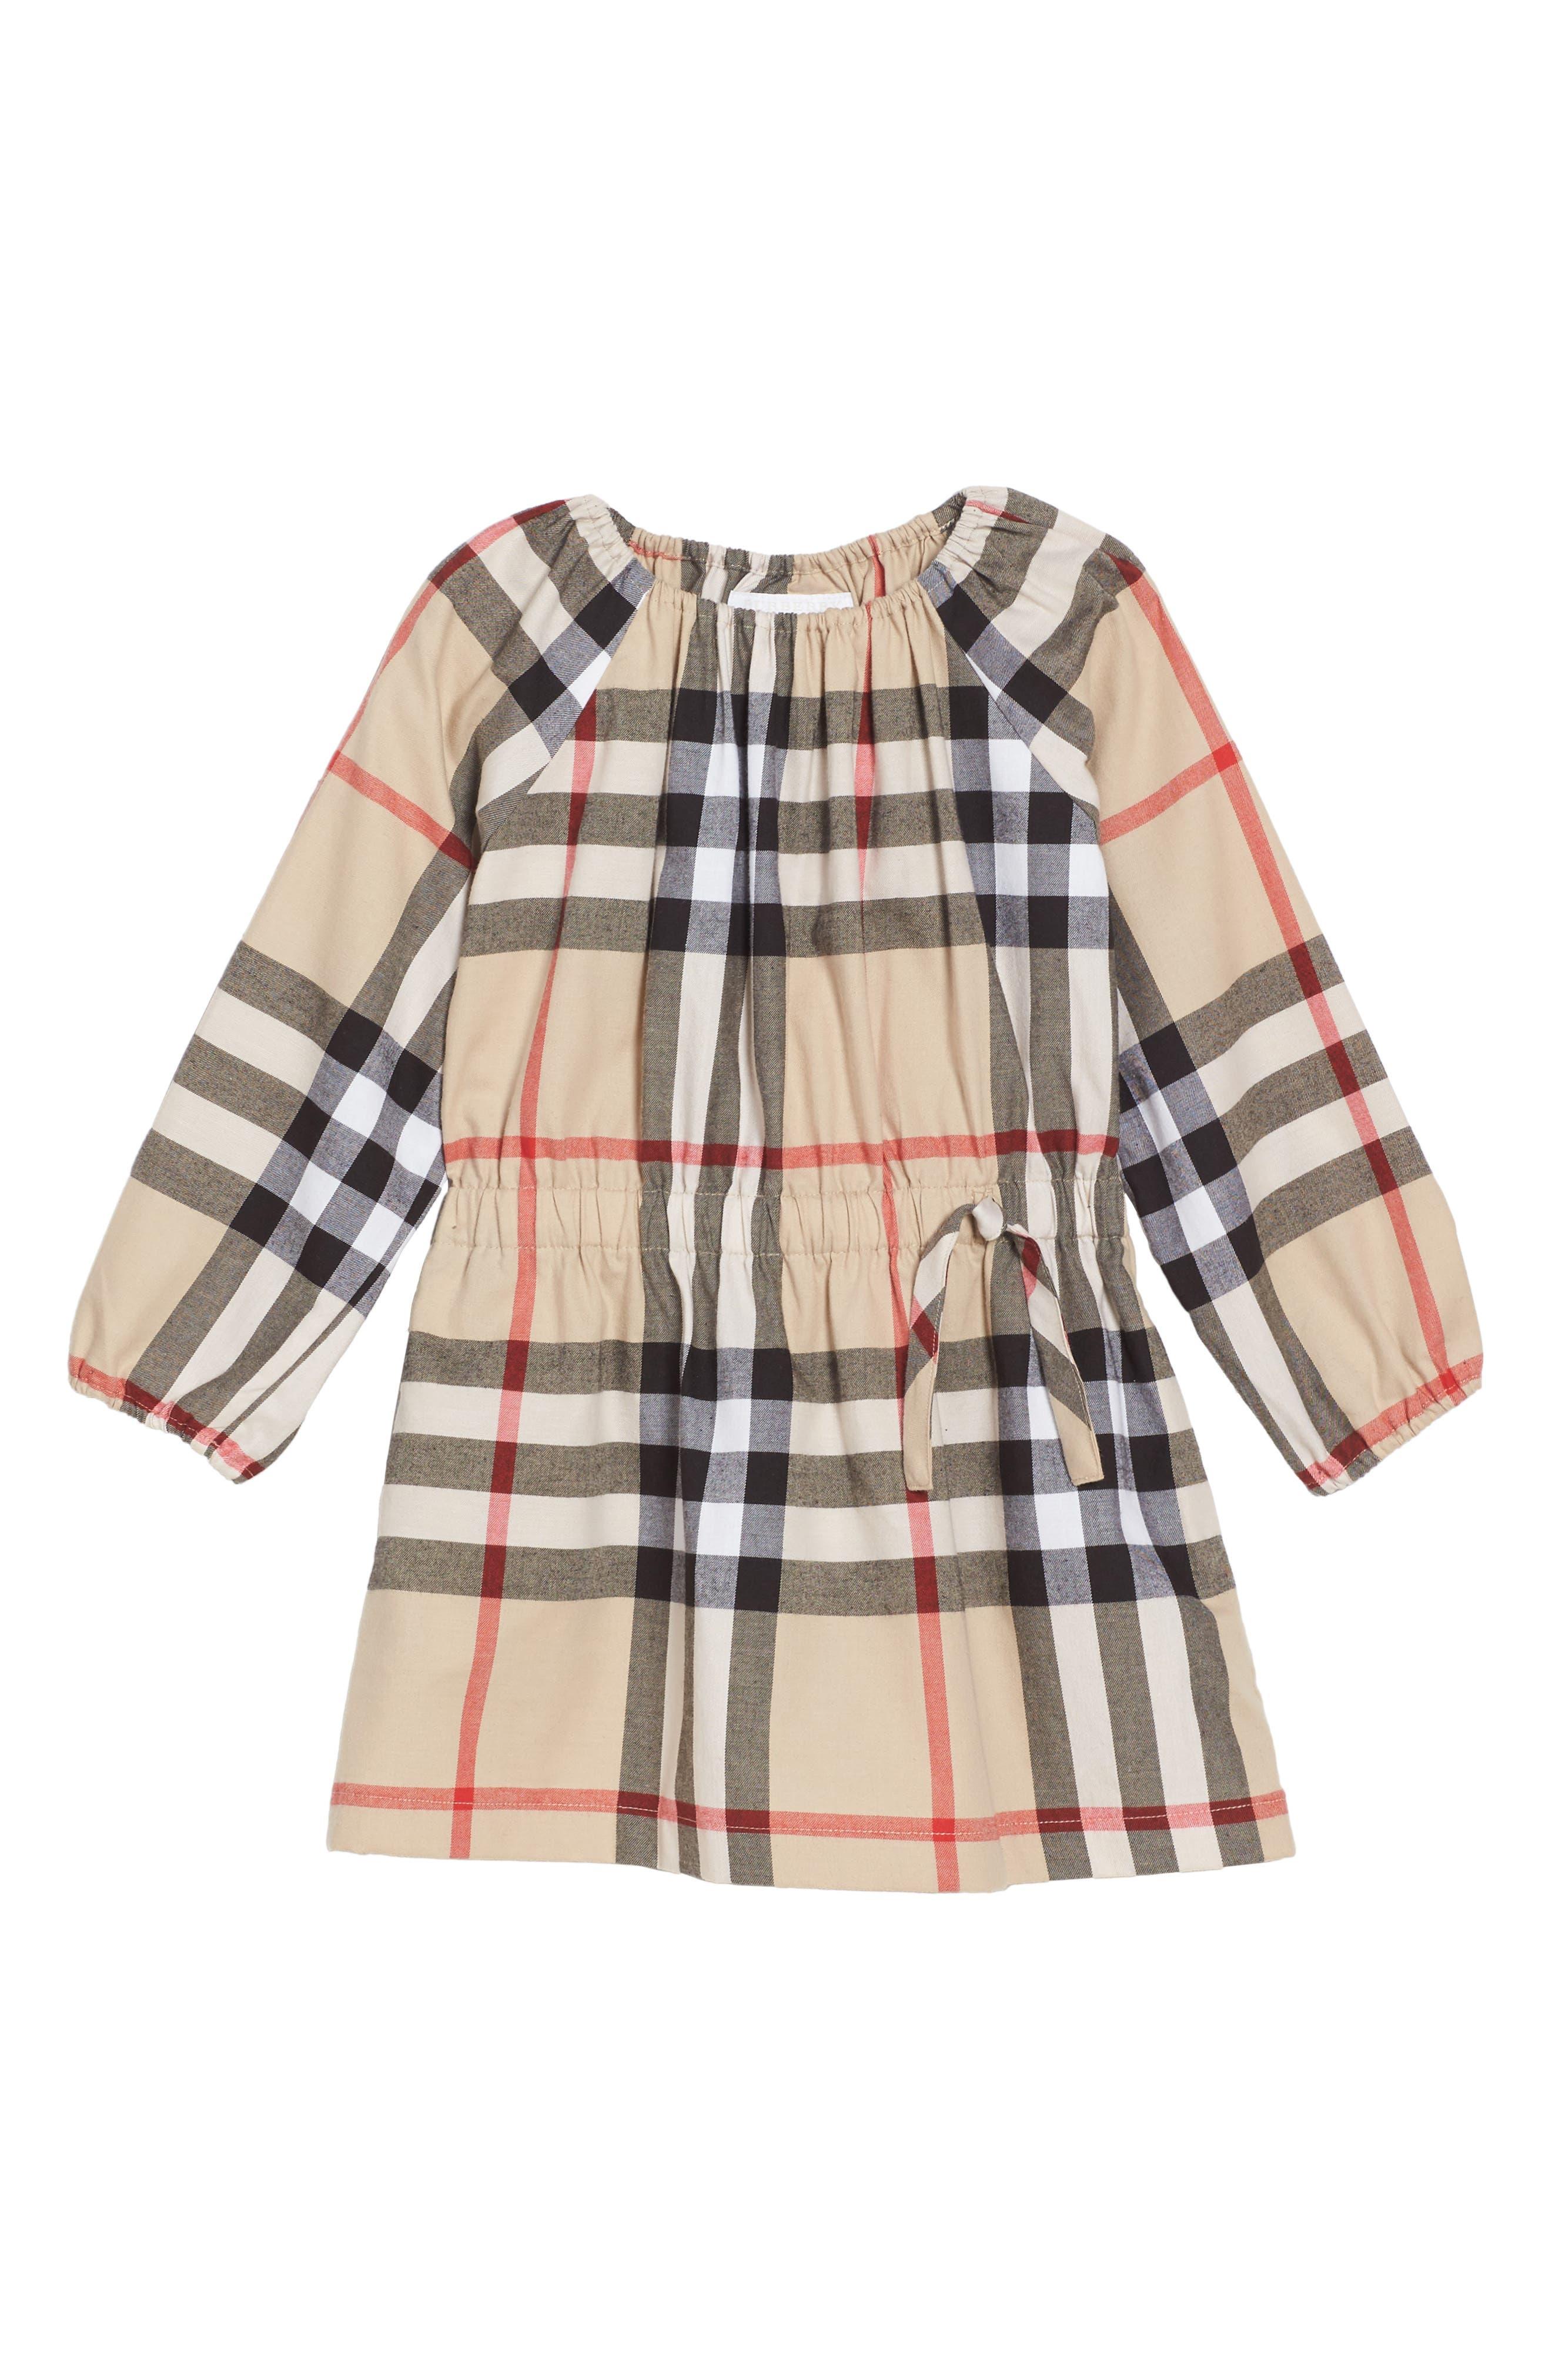 Alternate Image 1 Selected - Burberry Mini Kadyann Dress (Toddler Girls)